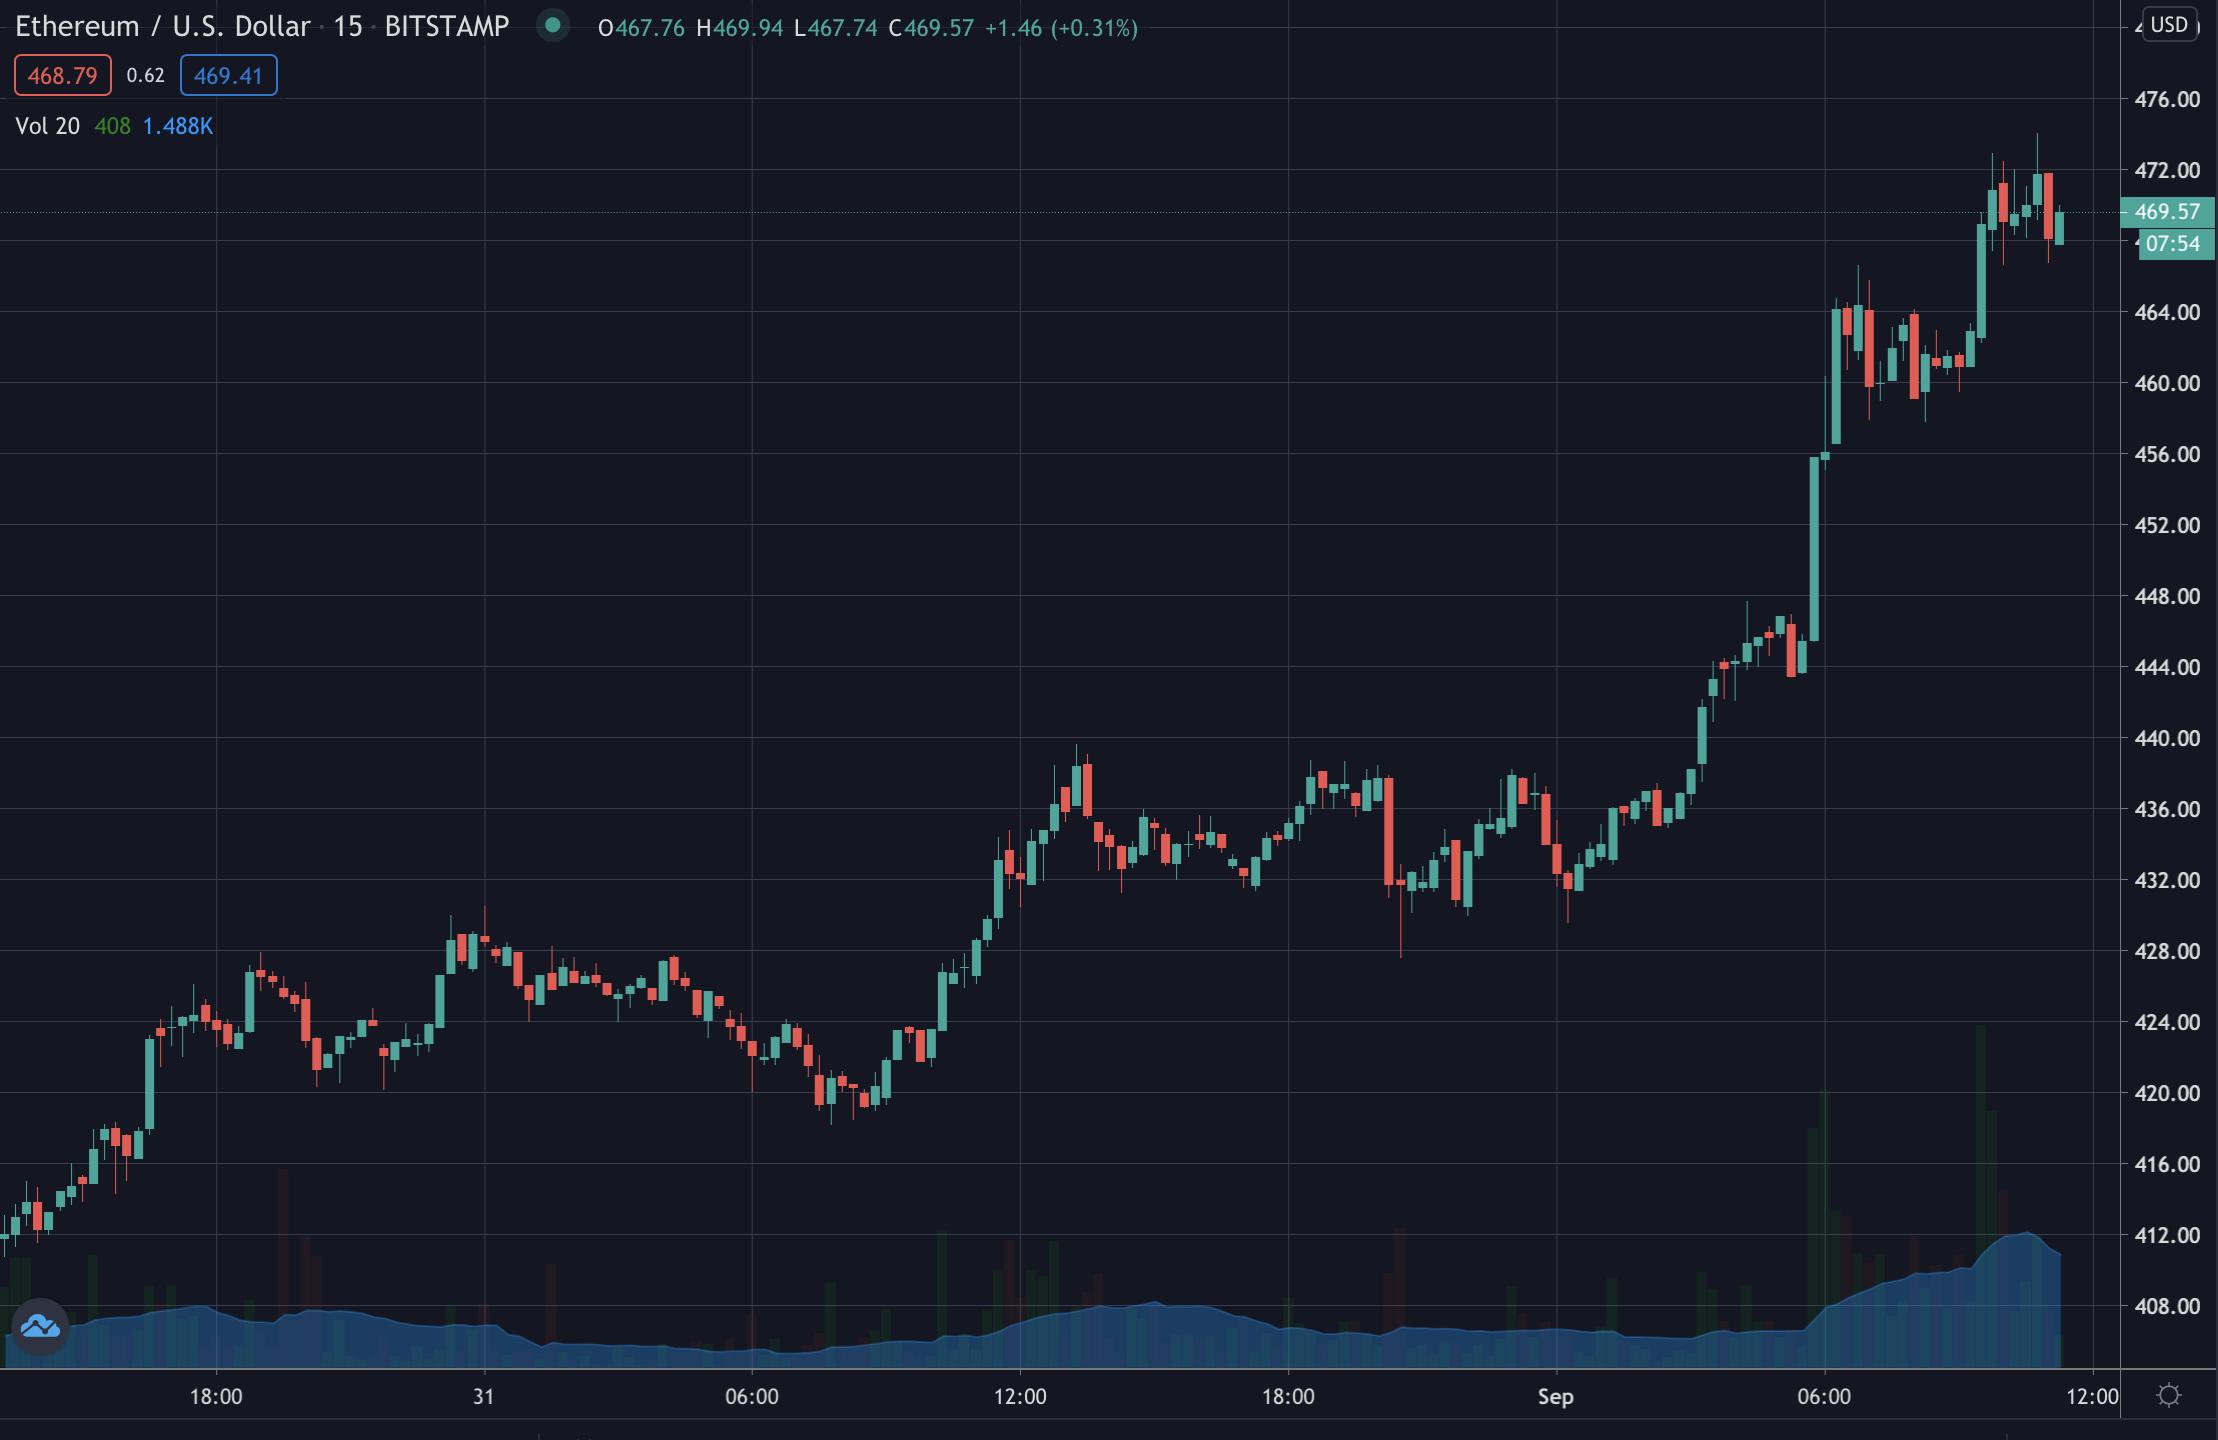 Ethereum's price, Sep 2020